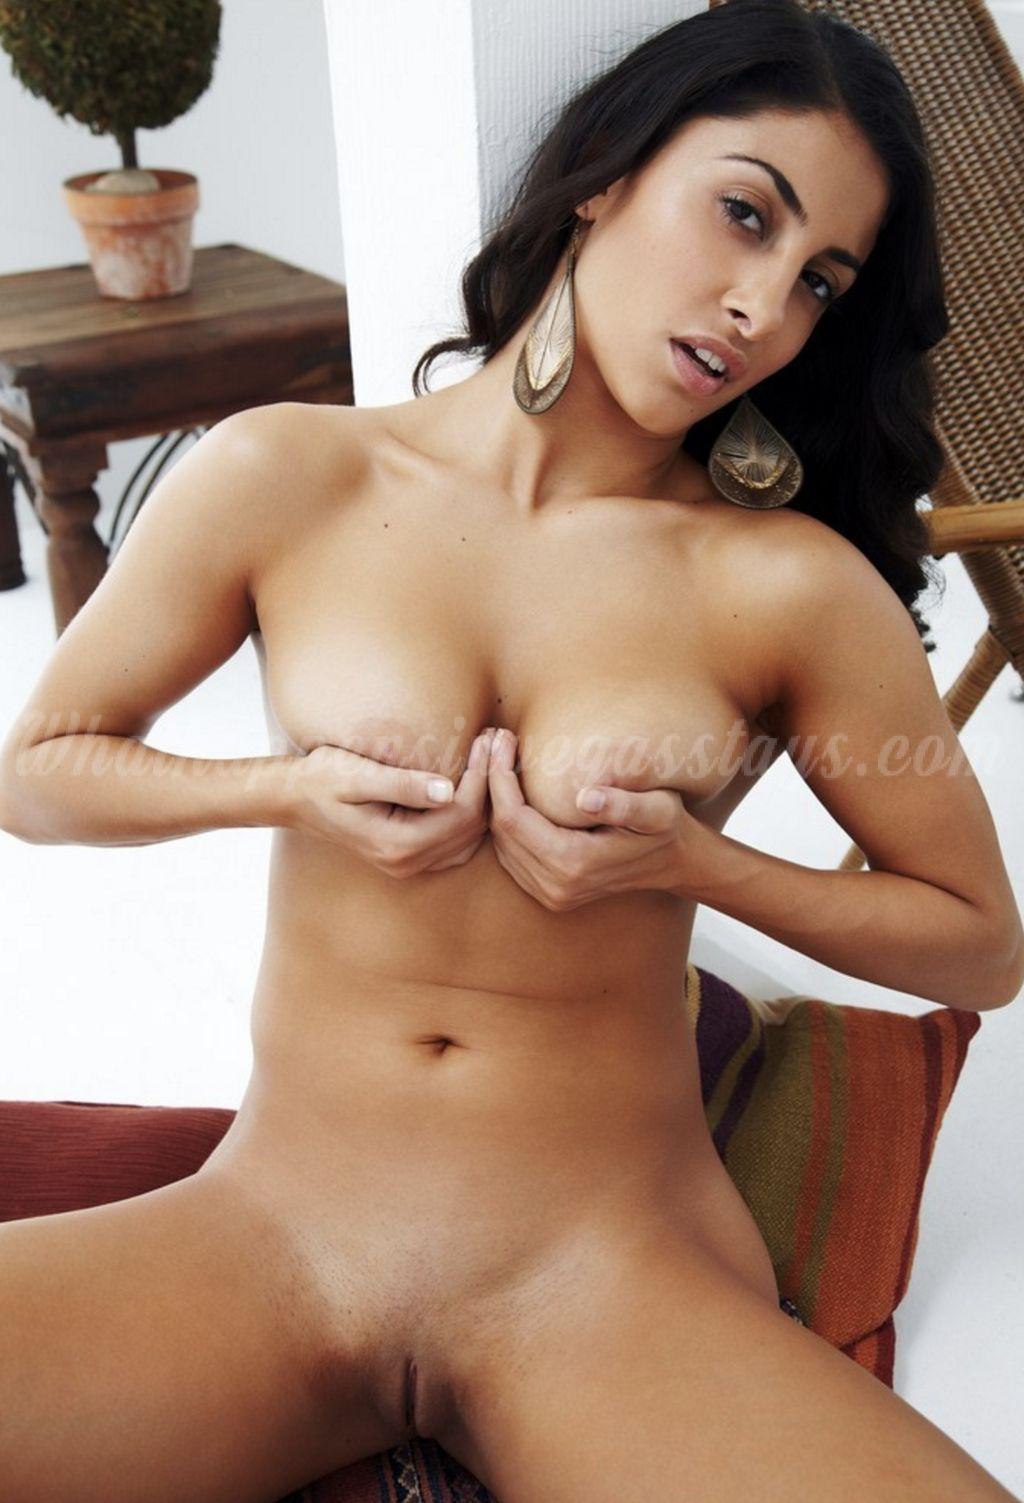 Exotic asian escorts las vegas GFE Escorts Las Vegas - Female Las Vegas Escorts